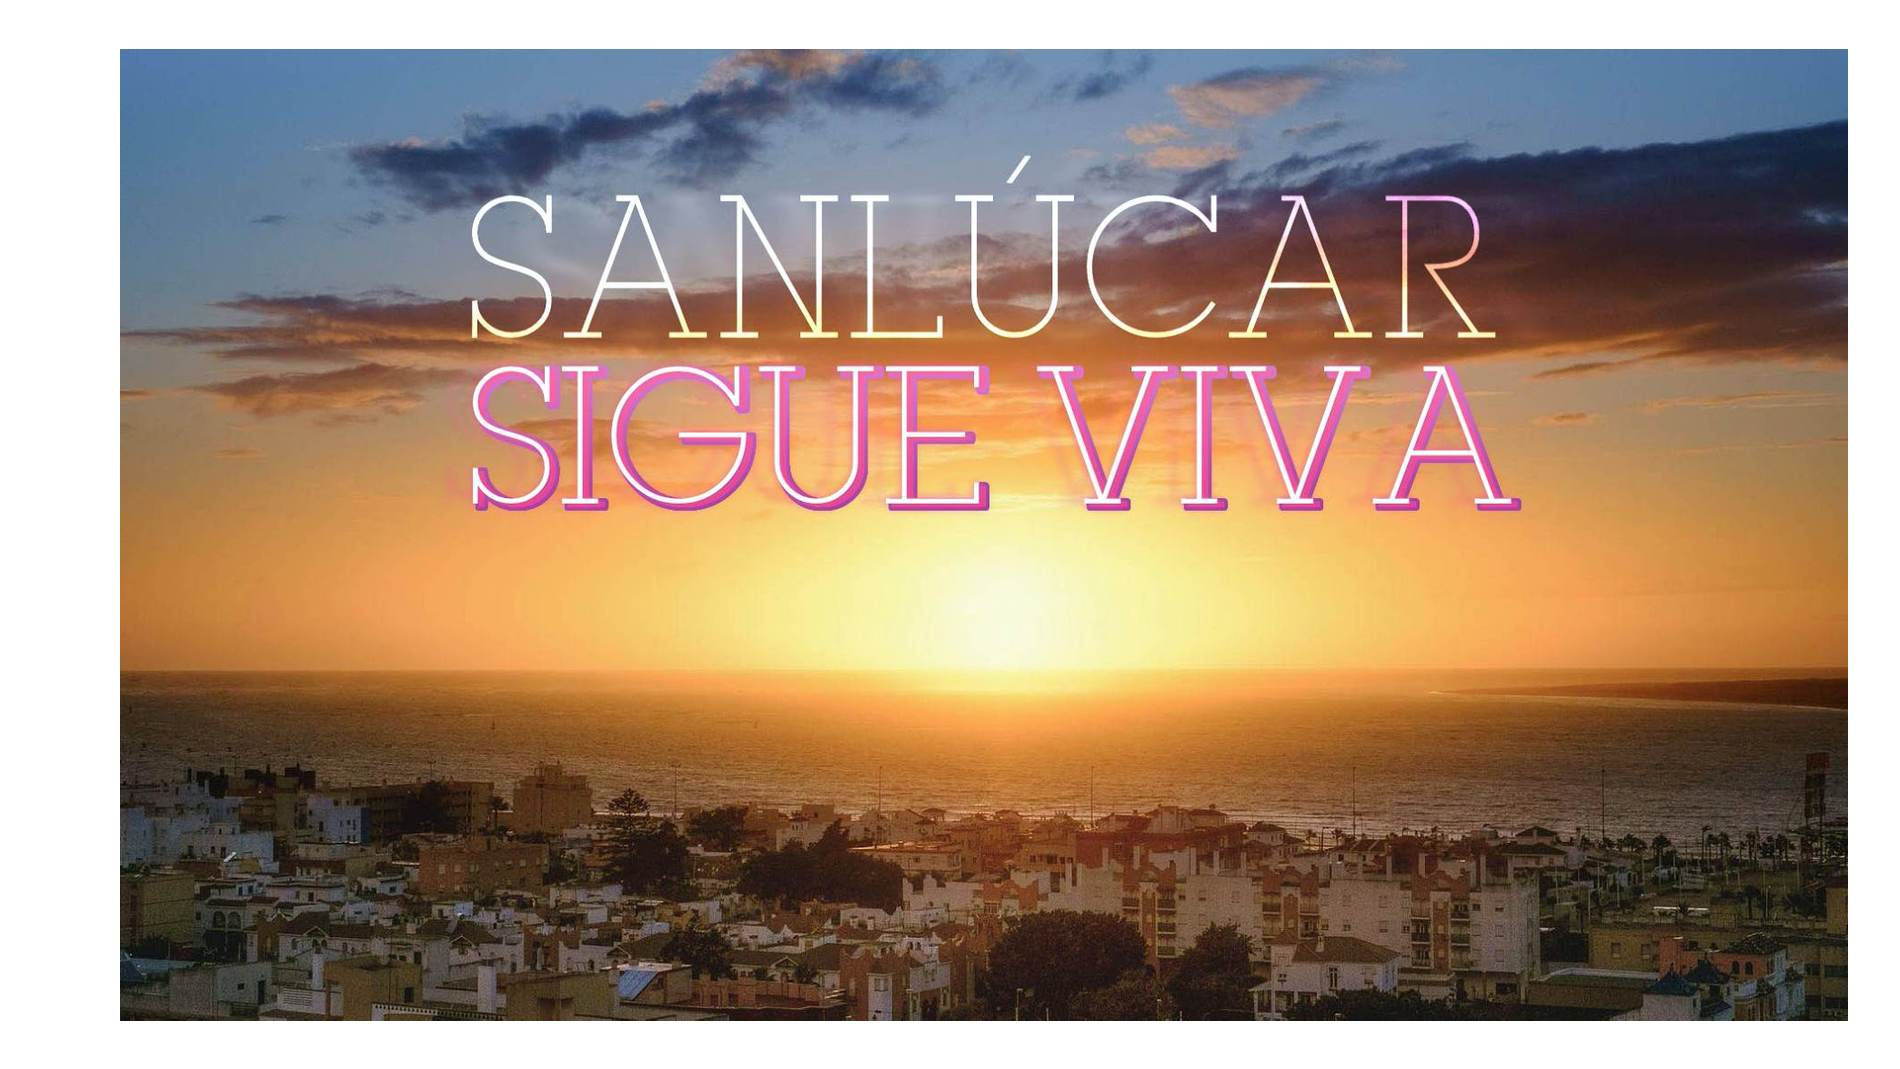 Sanlúcar Sigue Viva